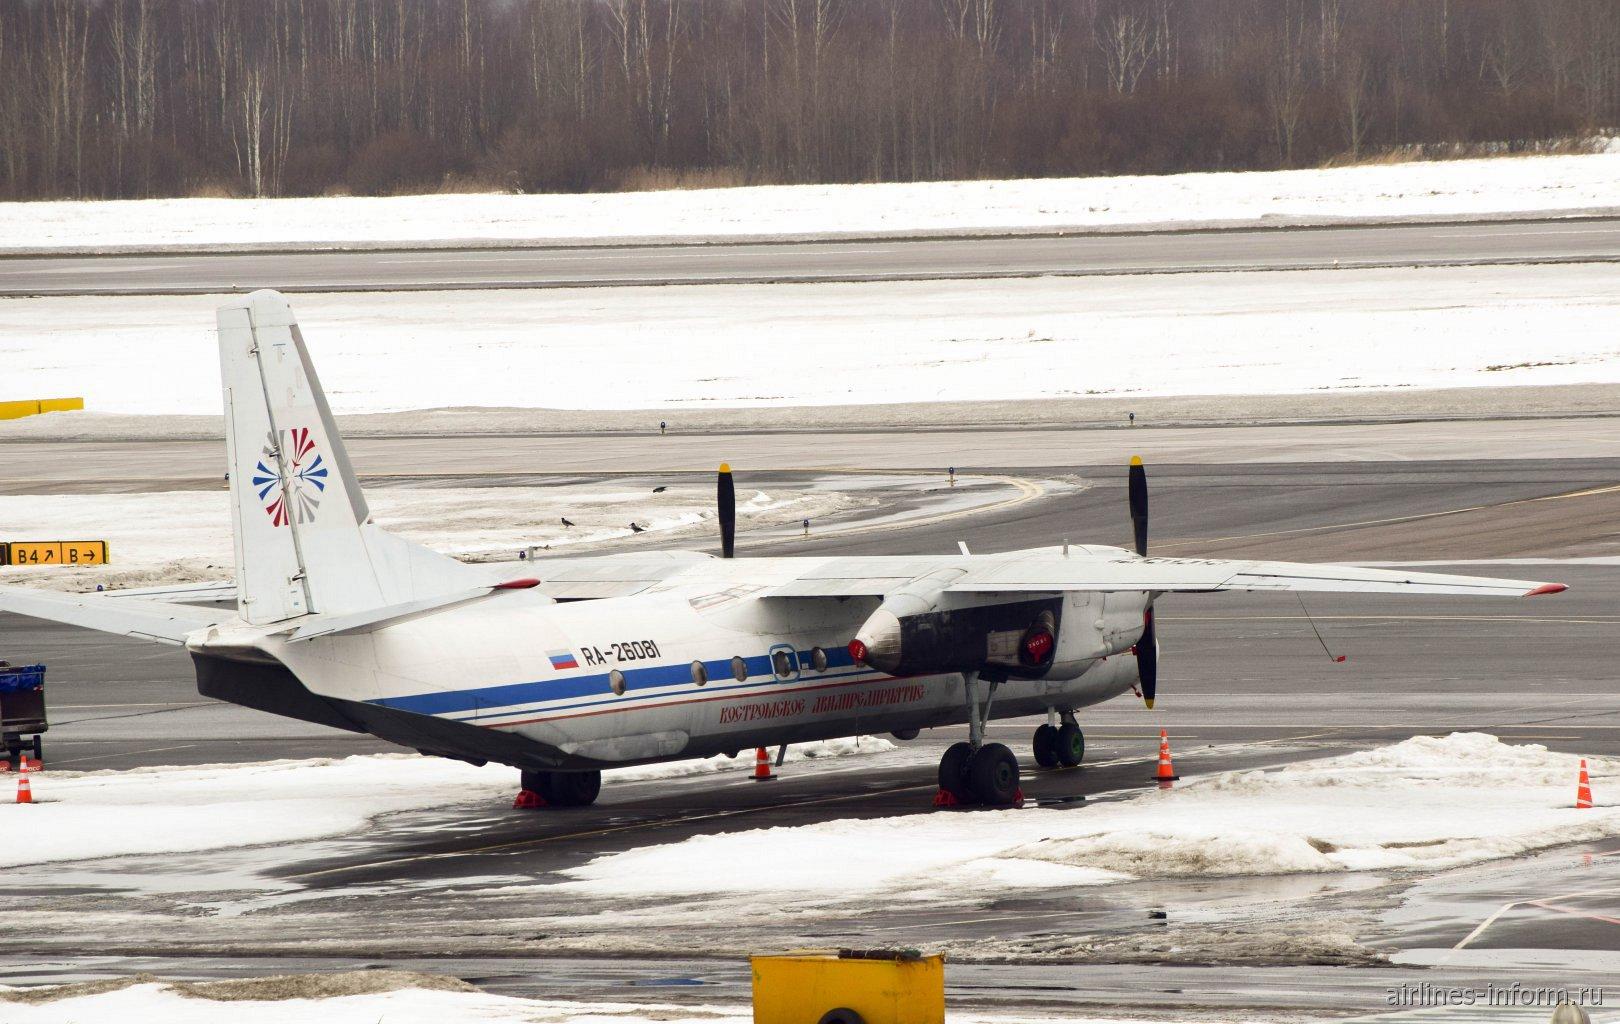 Самолет Ан-26 Костромского авиапредприятия в аэропорту Пулково